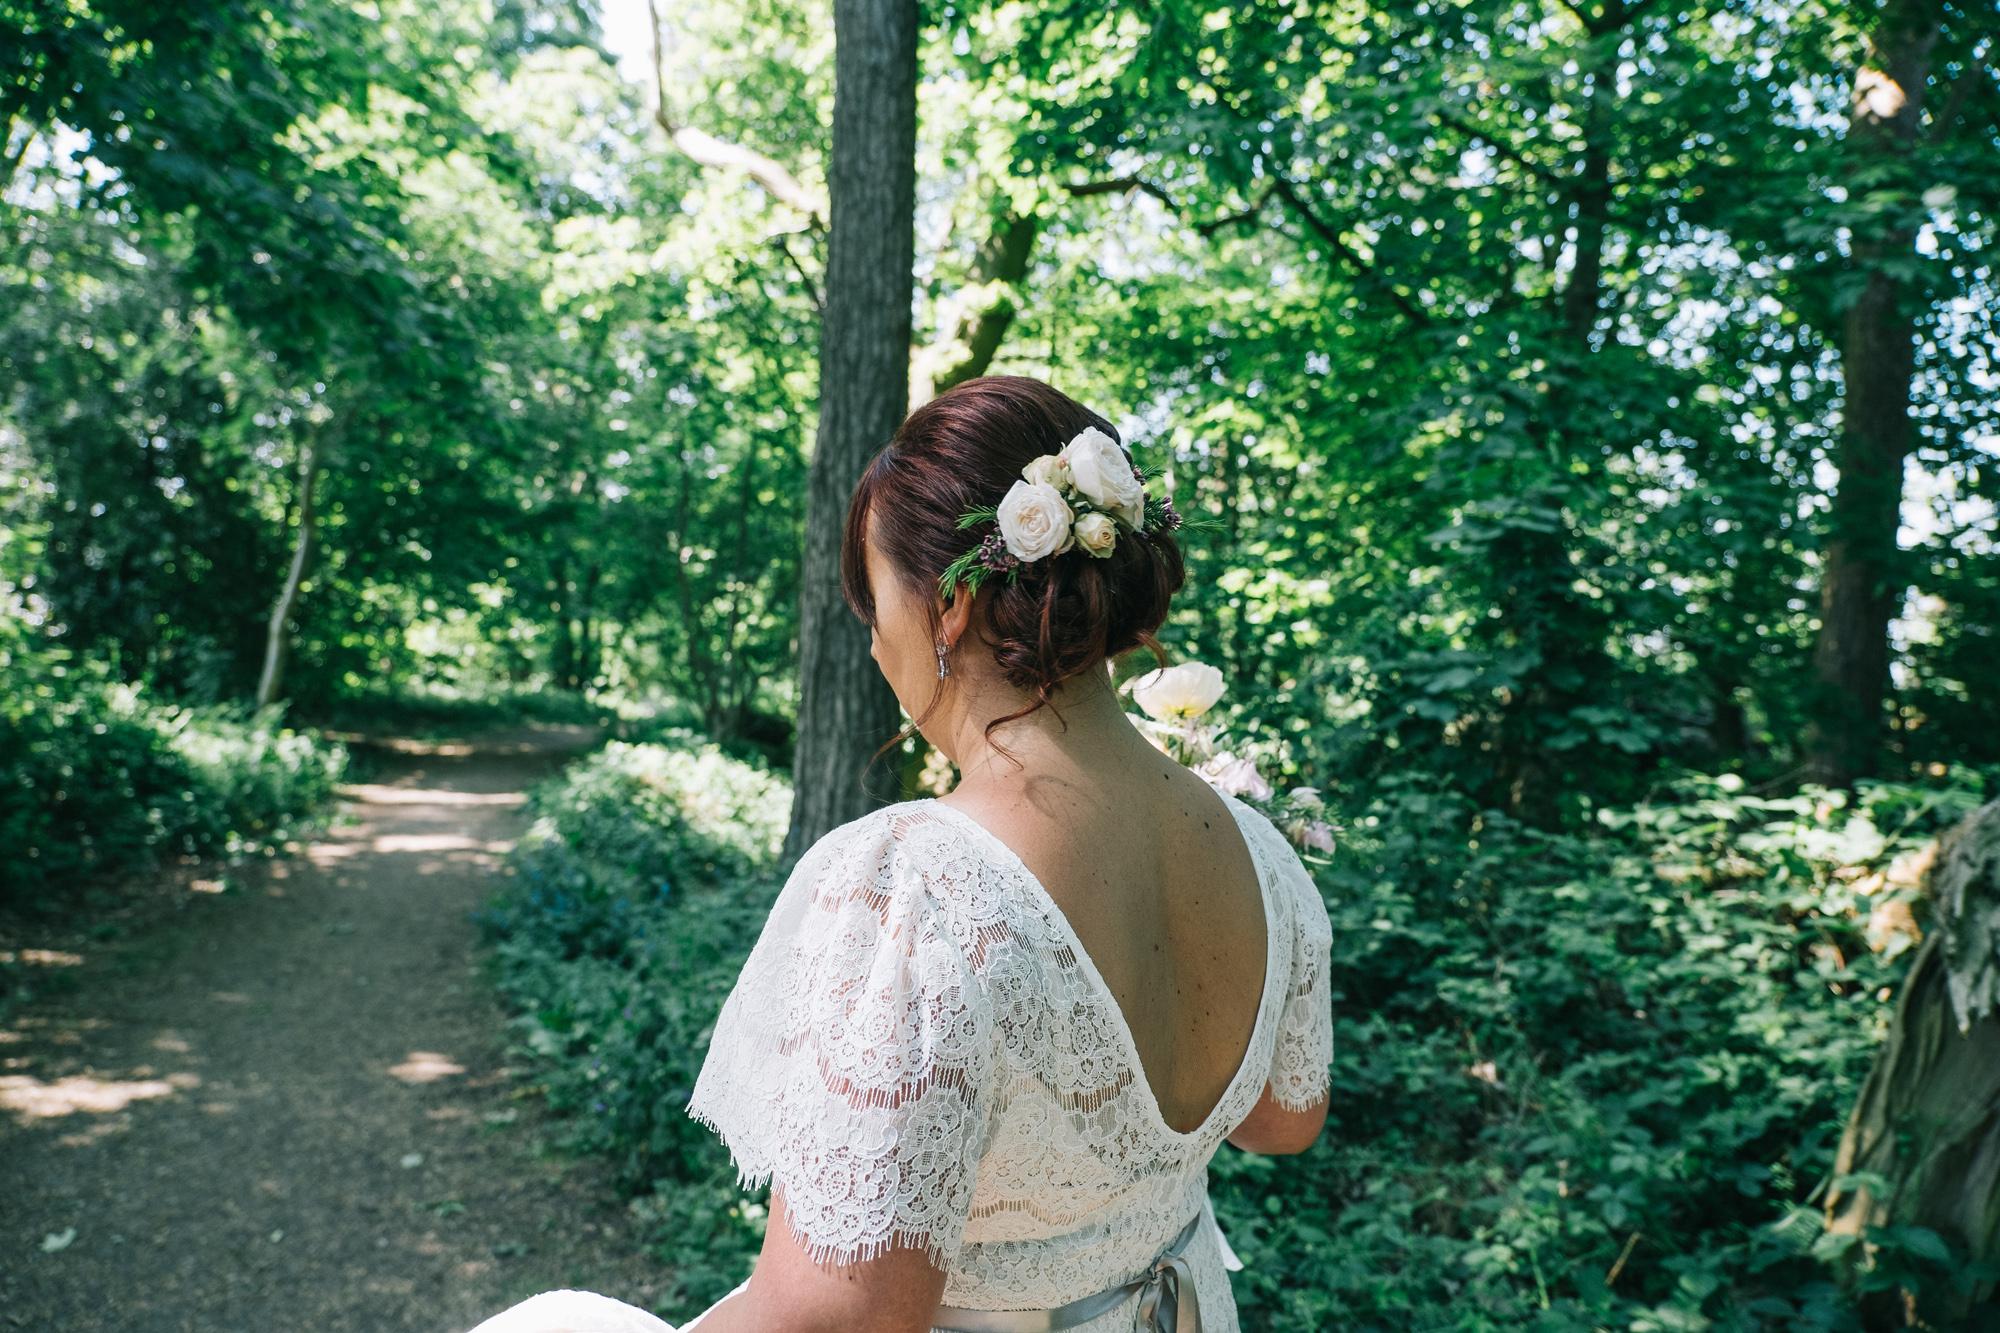 Bridgette-Dahlia-Blush-Silk-Lace-Wedding-Dress-Kate-Beaumont-Sheffield-Ivory-Fayre-18.jpg